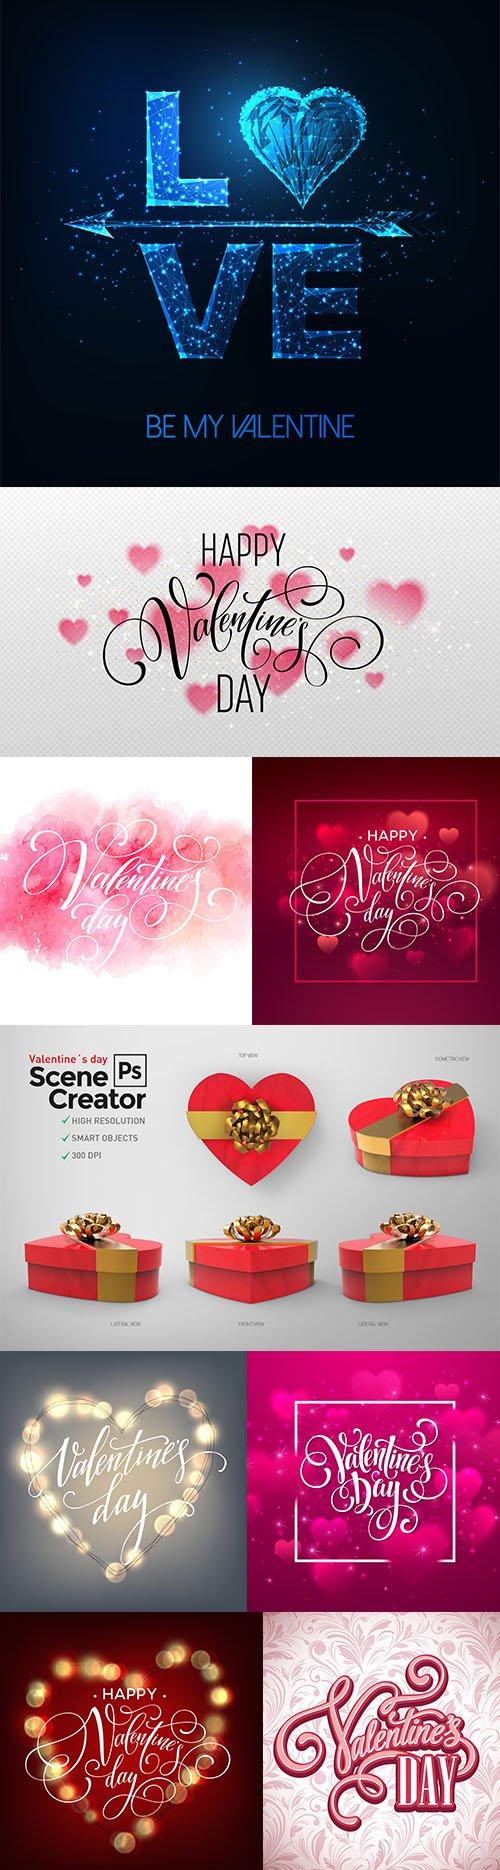 Happy Valentines Day Greeting Card and Bonus Scene Creator